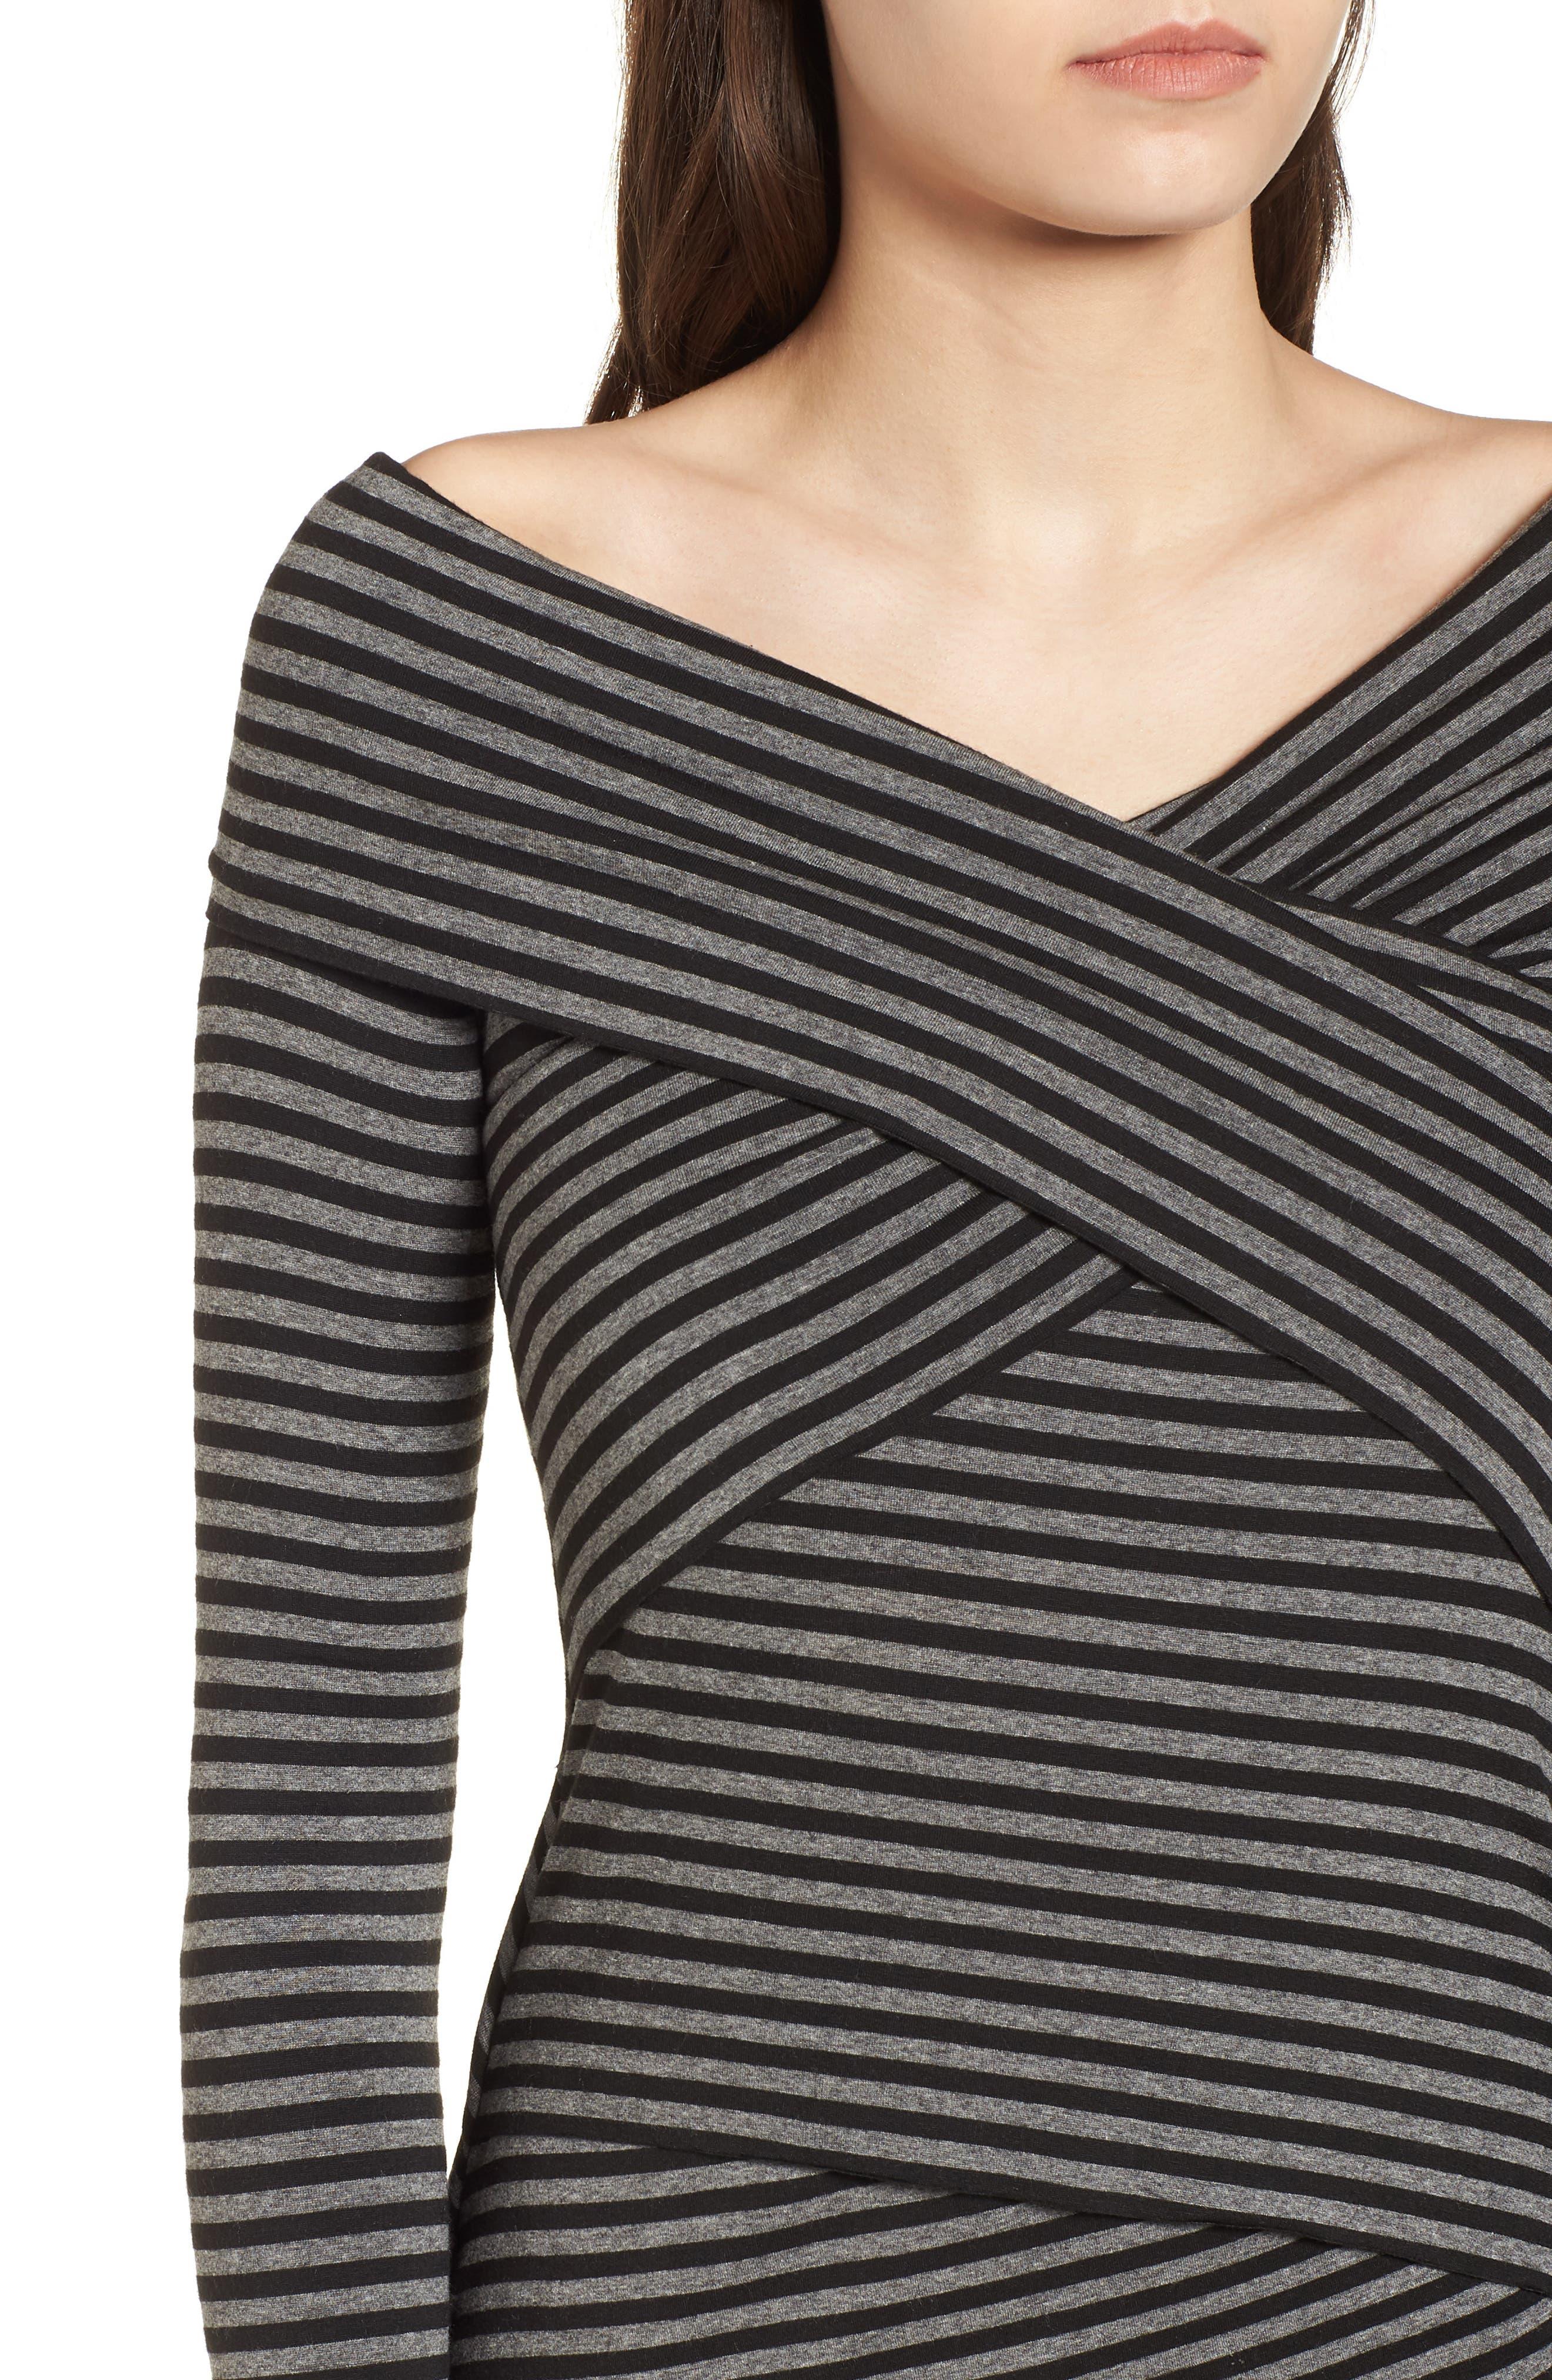 Edamame Body-Con Dress,                             Alternate thumbnail 4, color,                             Black Grey